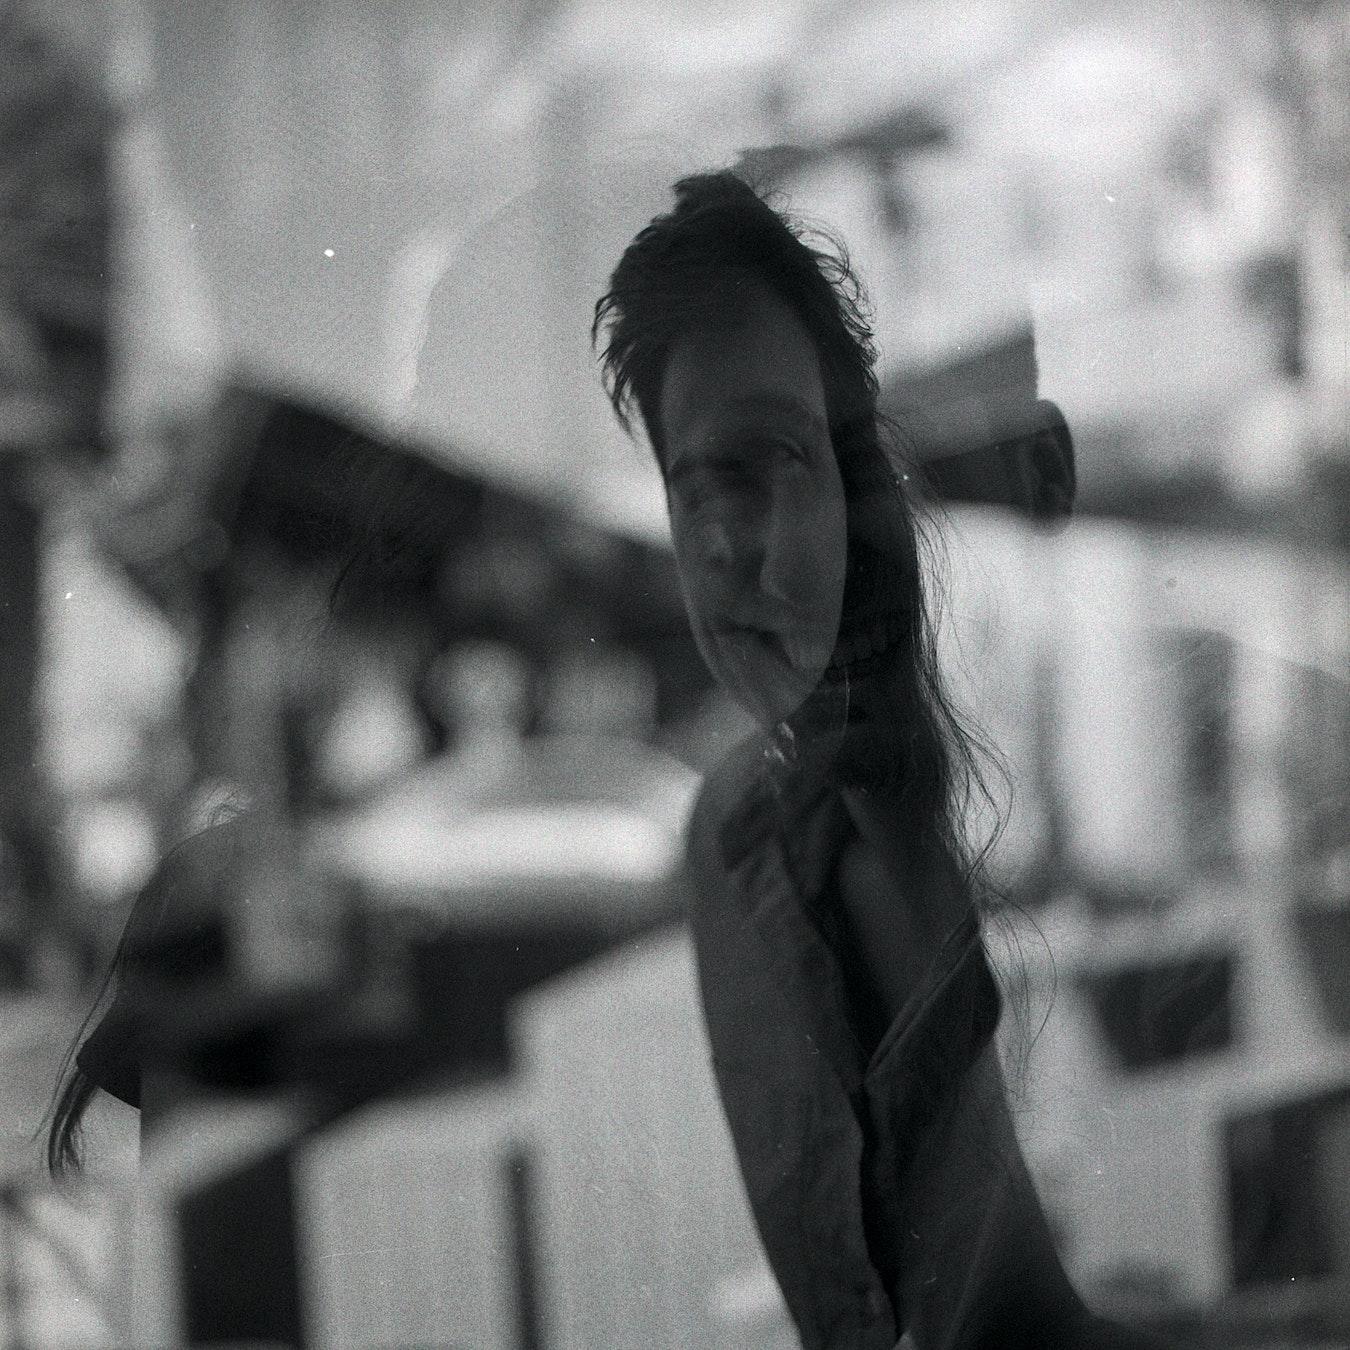 200802_KDV_Hasselblad_1